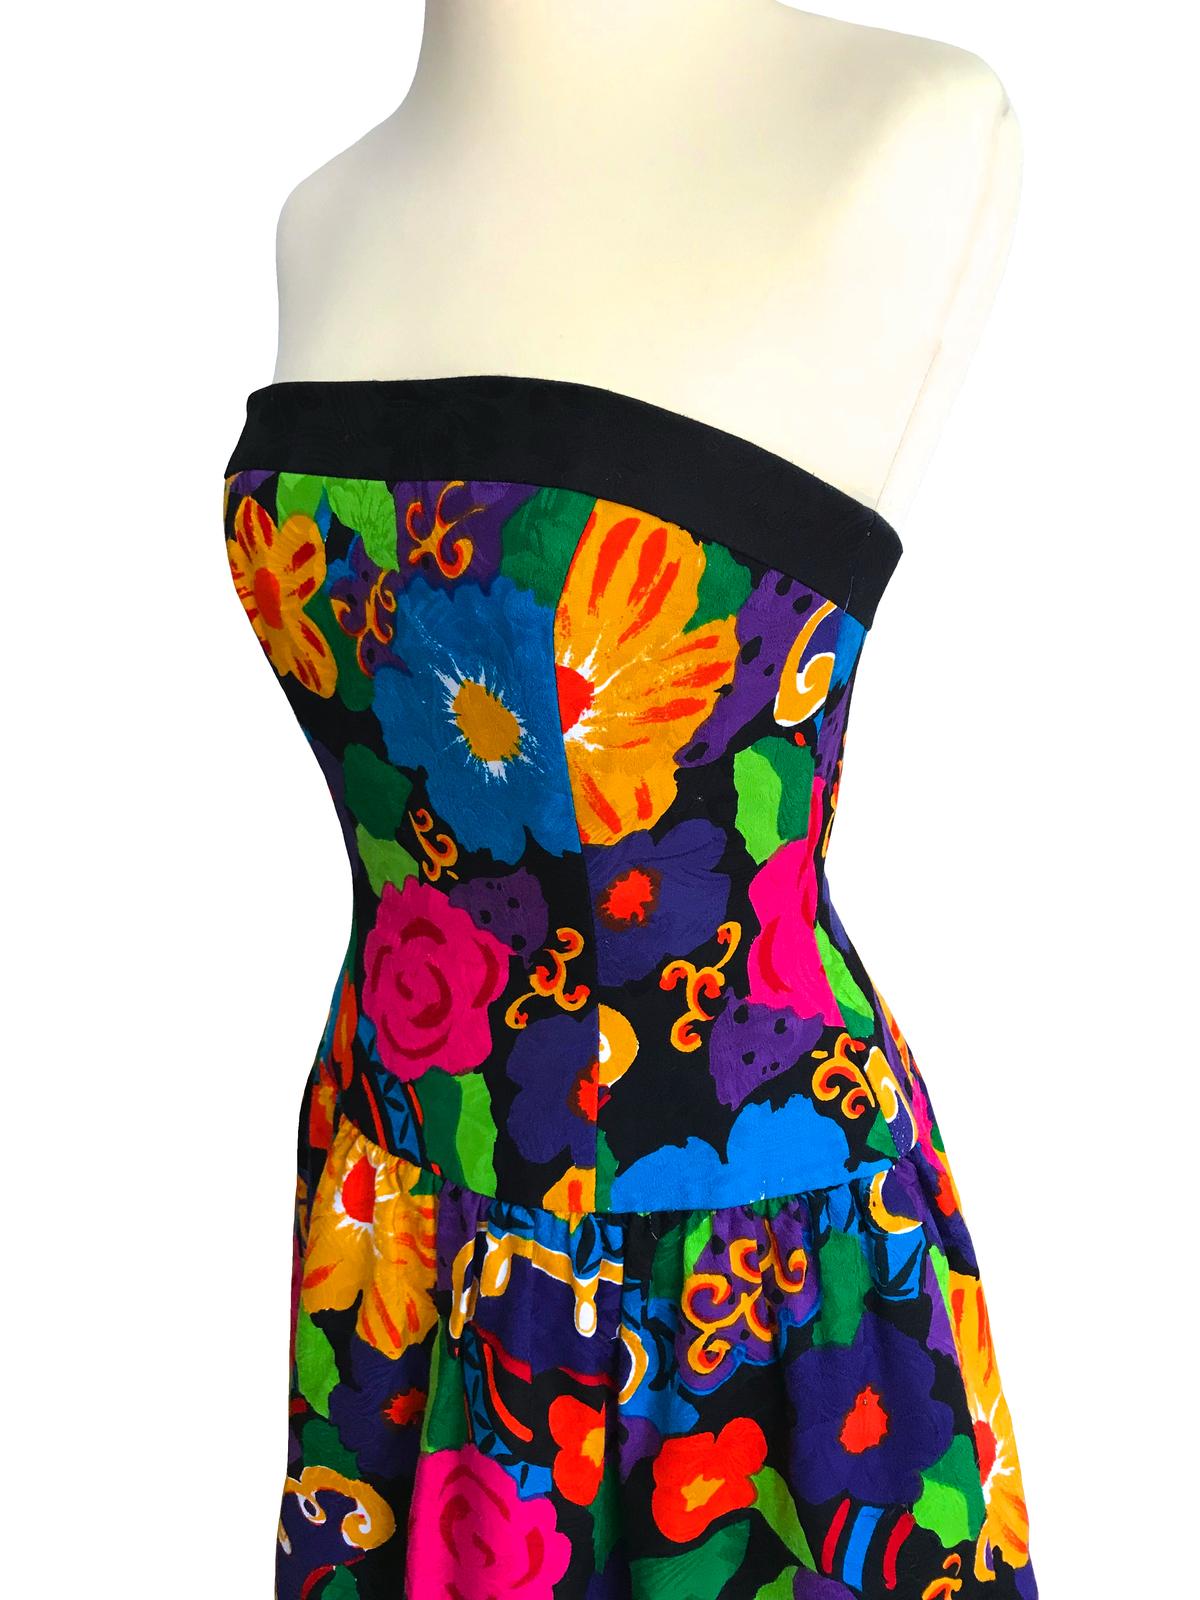 80s Vtg A.J. Bari Bold Color Textured Cotton Floral Print Strapless Corset Dress